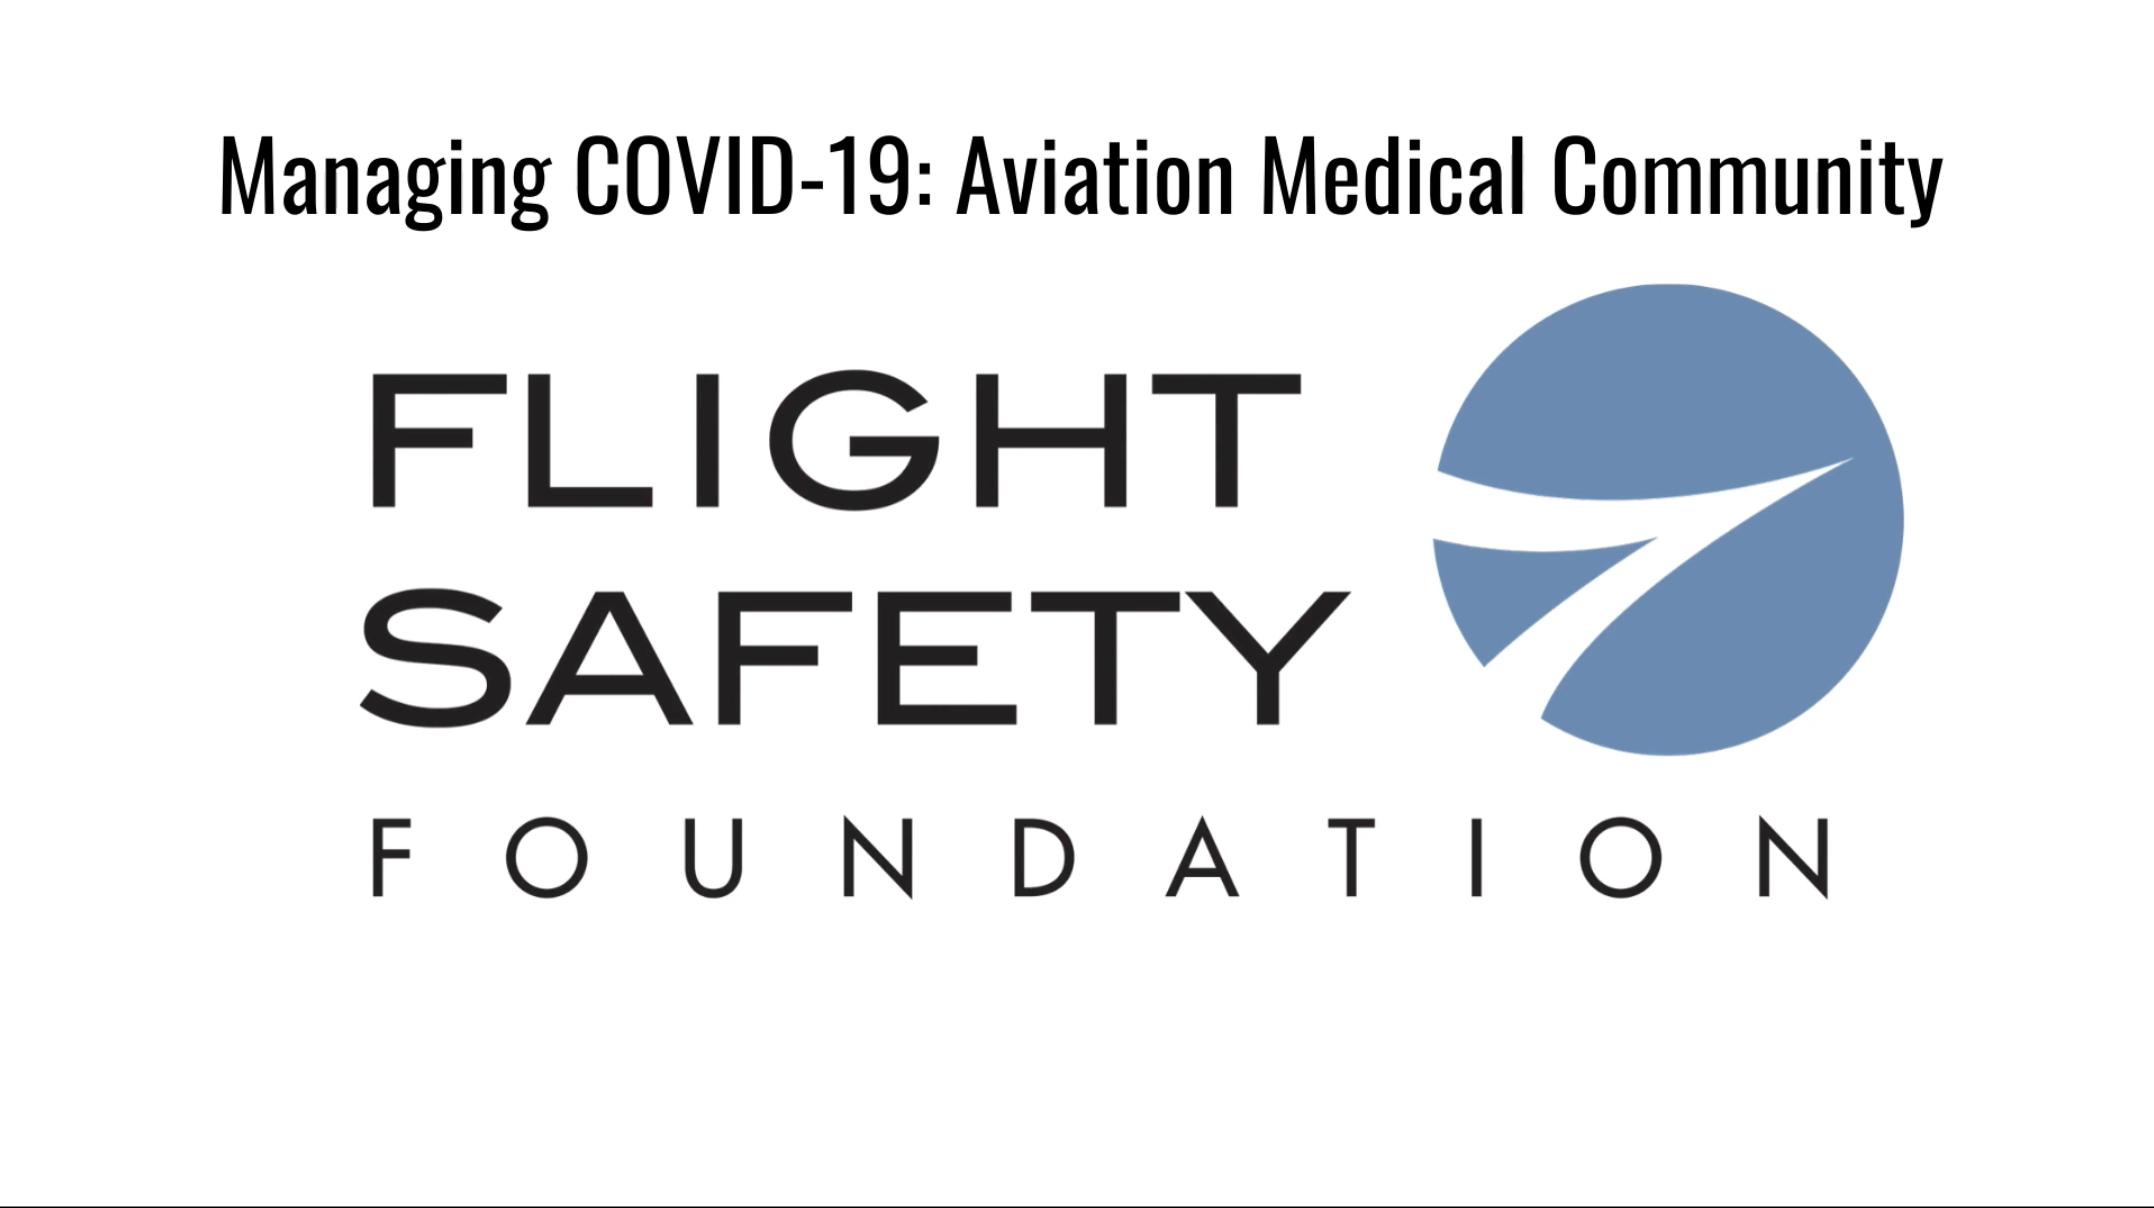 Managing COVID-19: Aviation Medical Community